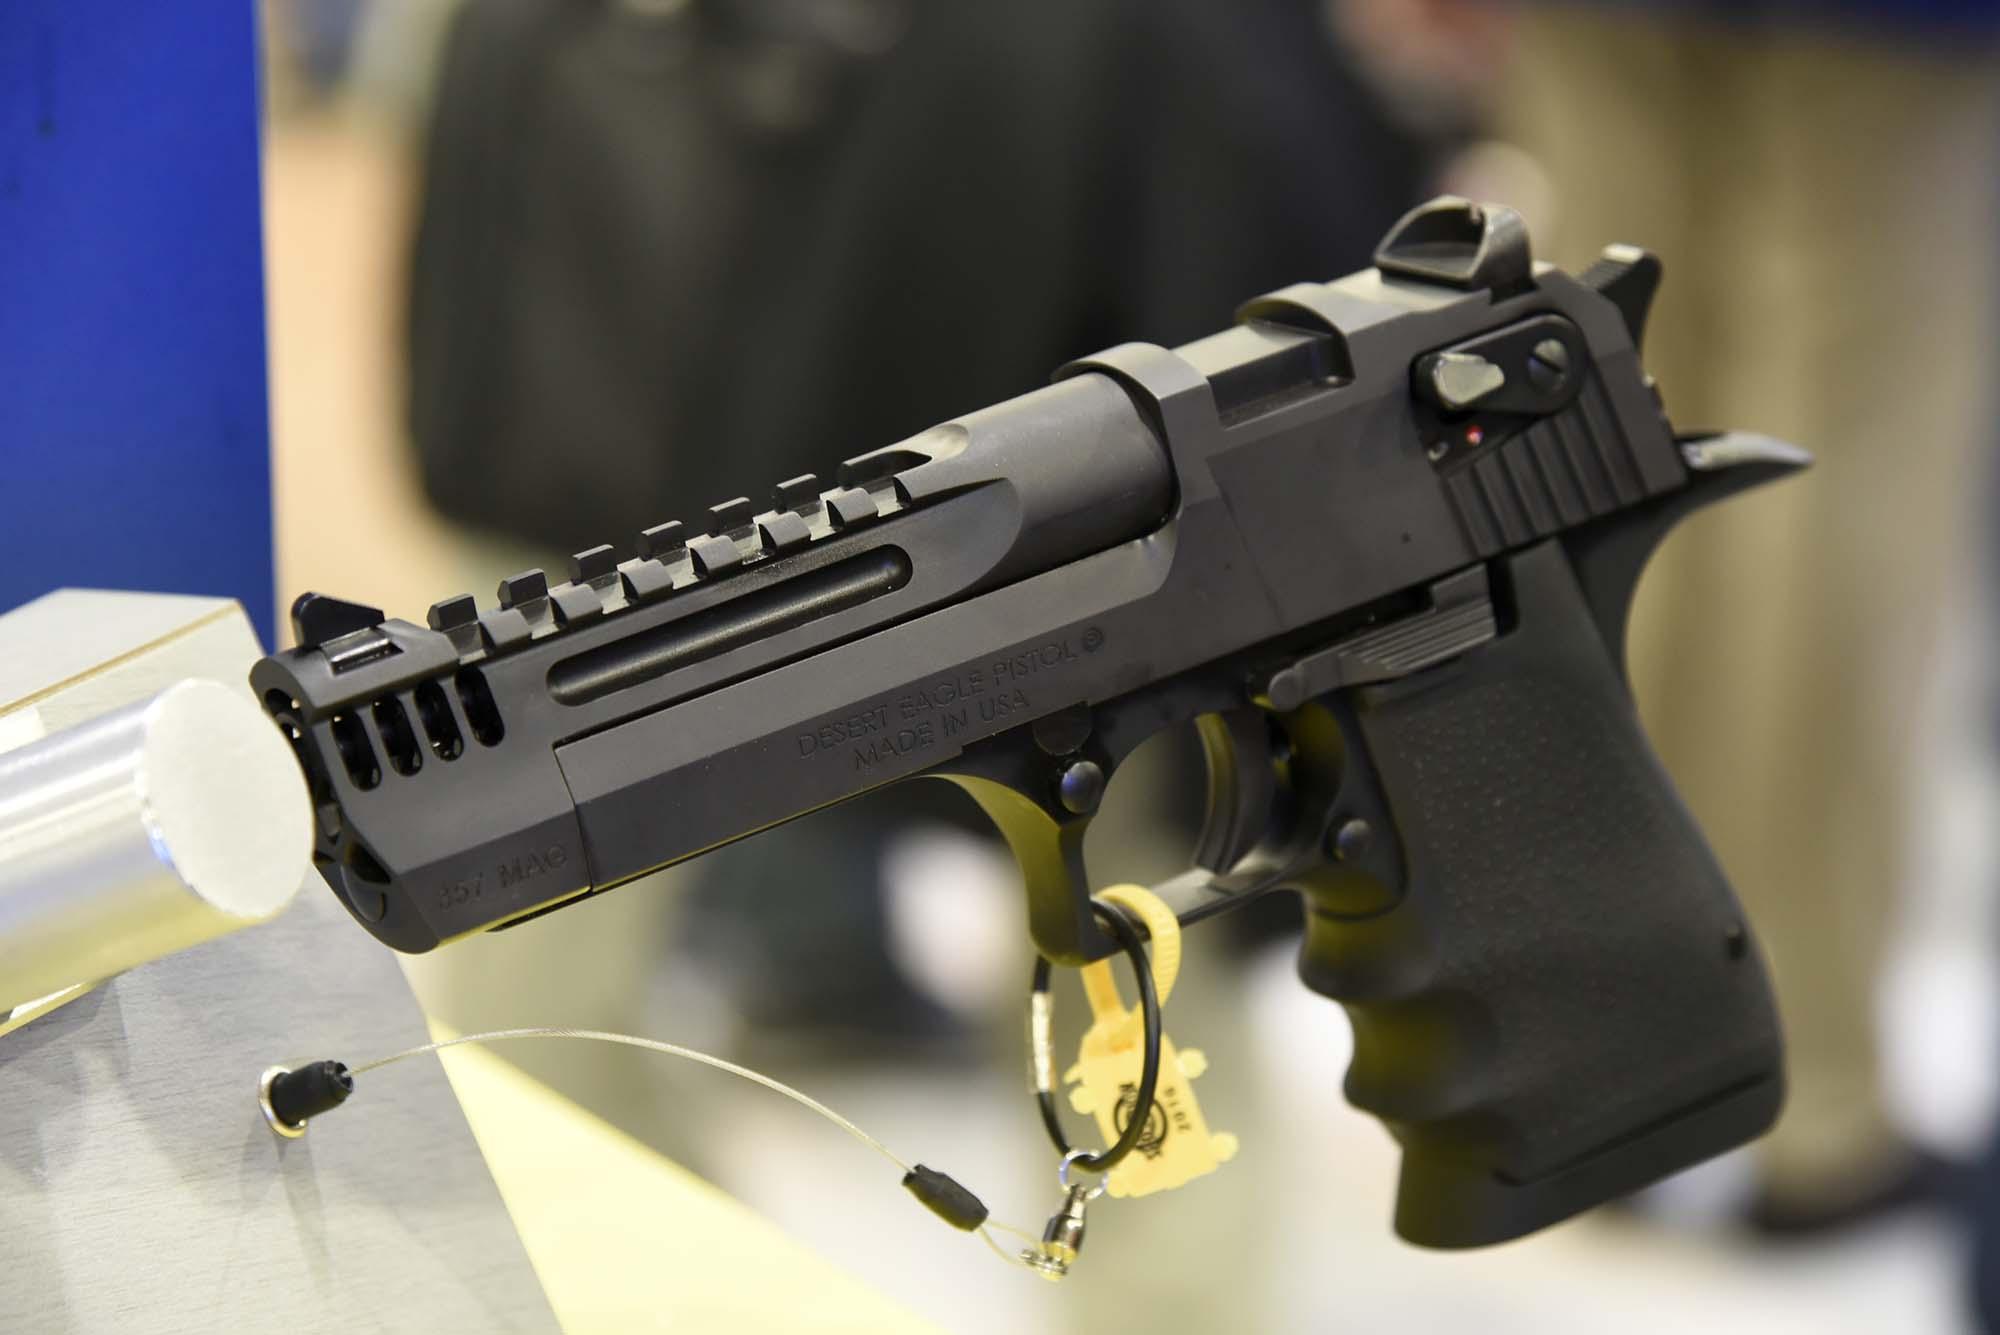 New Lightweight Desert Eagles Pistols Gunsweek Com